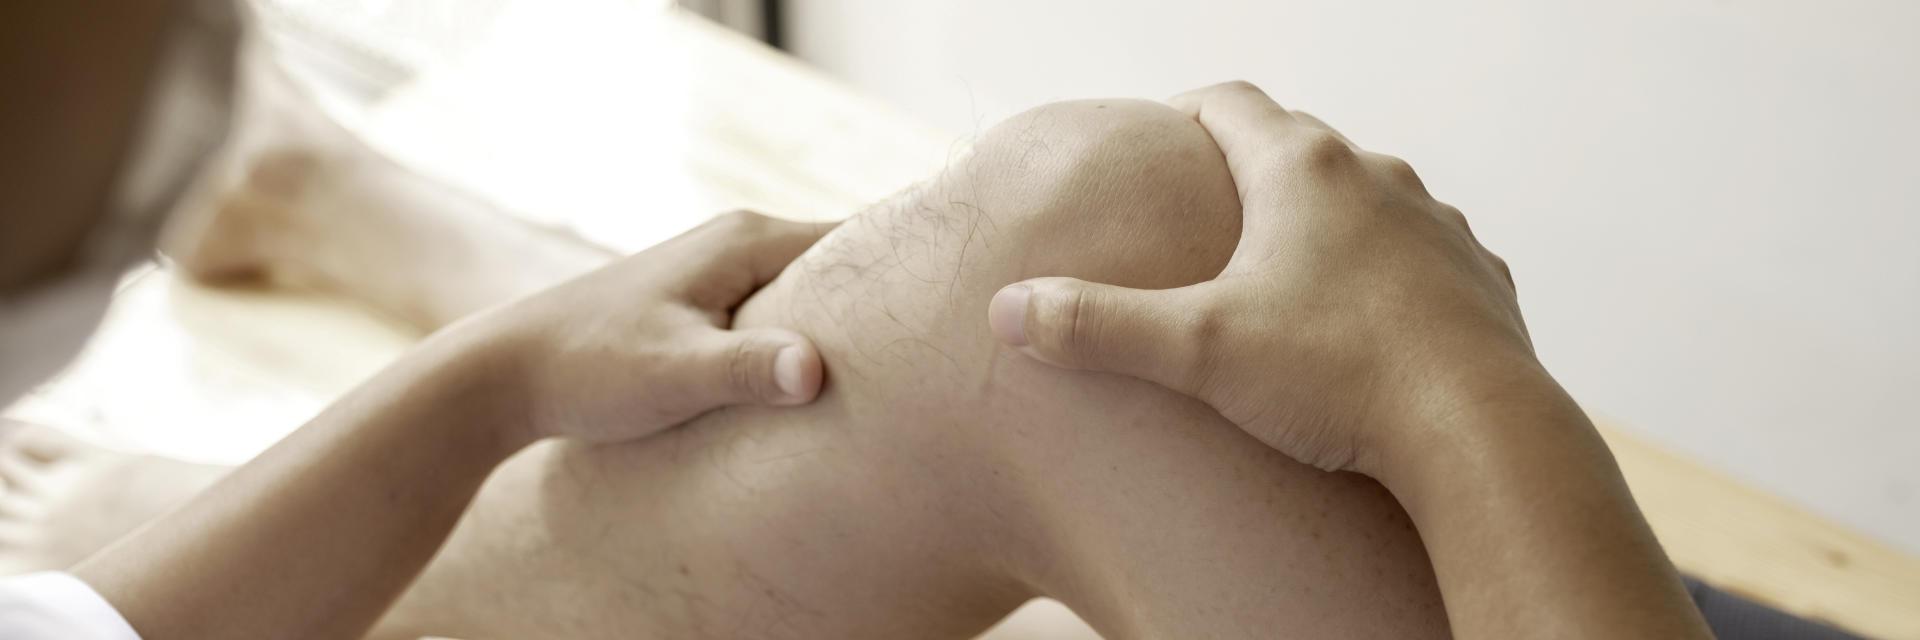 An orthopedic surgeon examining patient's knee.